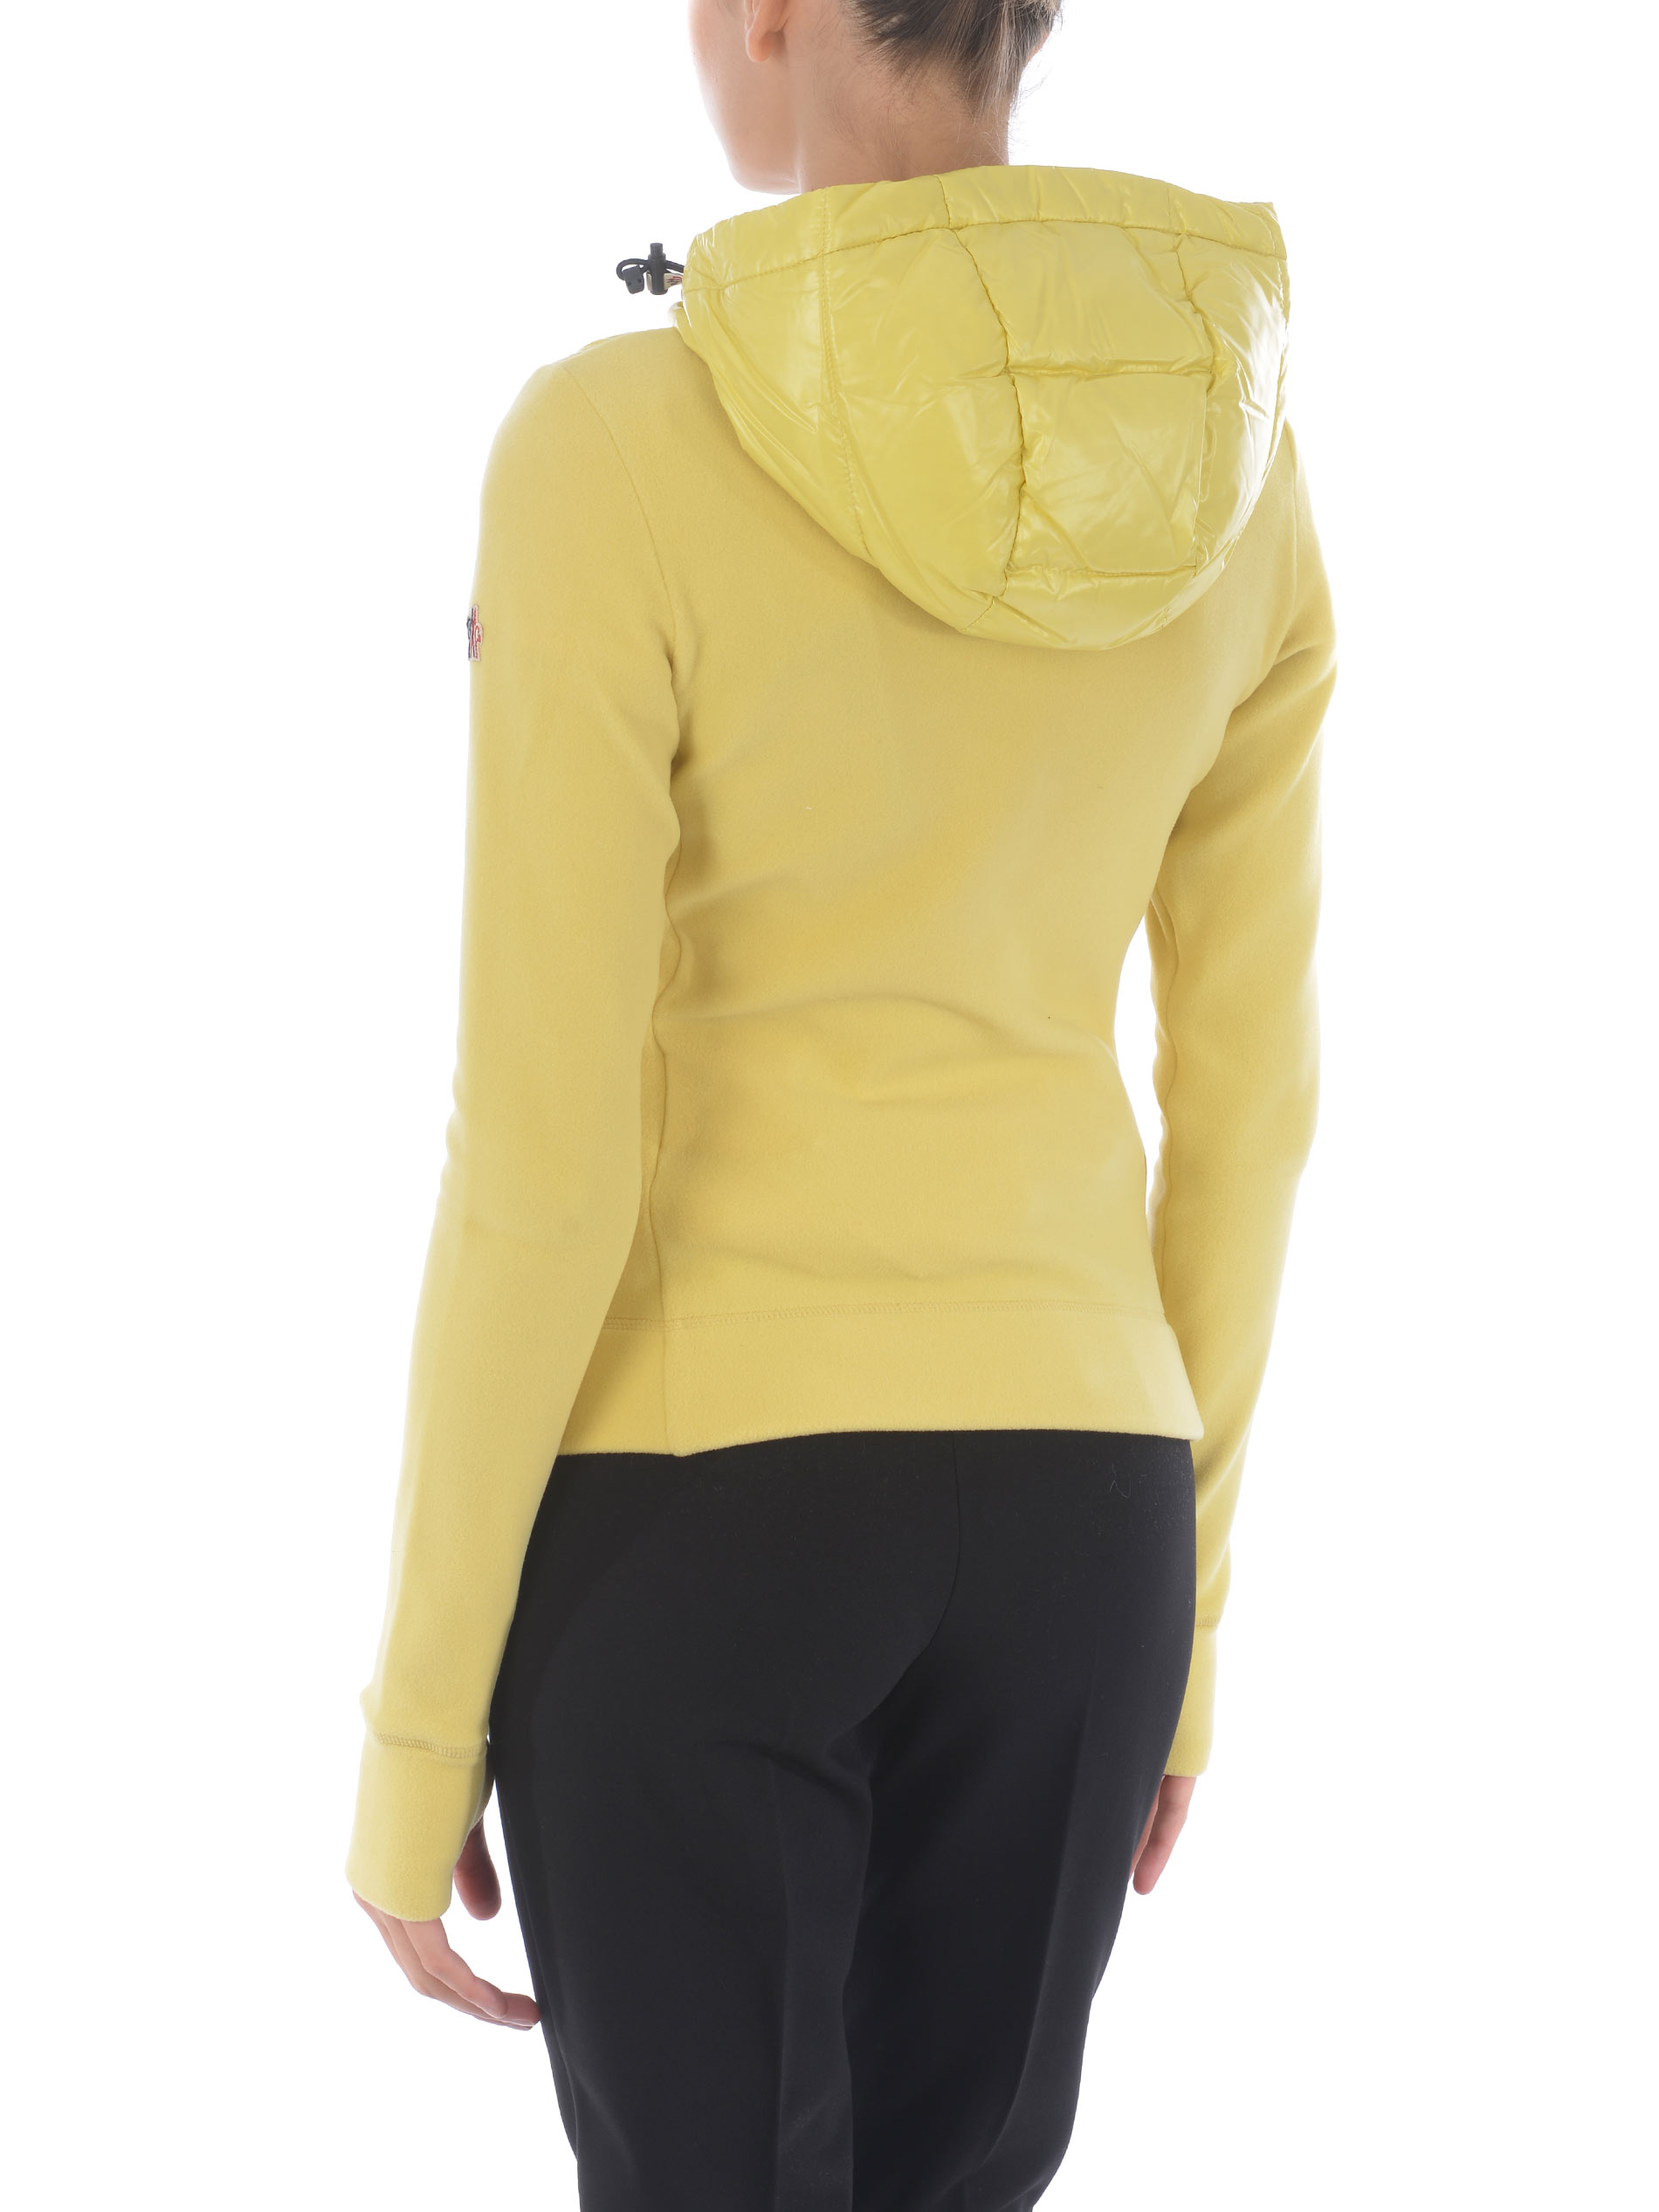 Moncler sweatshirt  MONCLER GRENOBLE   10000005   8G500-0080093-110